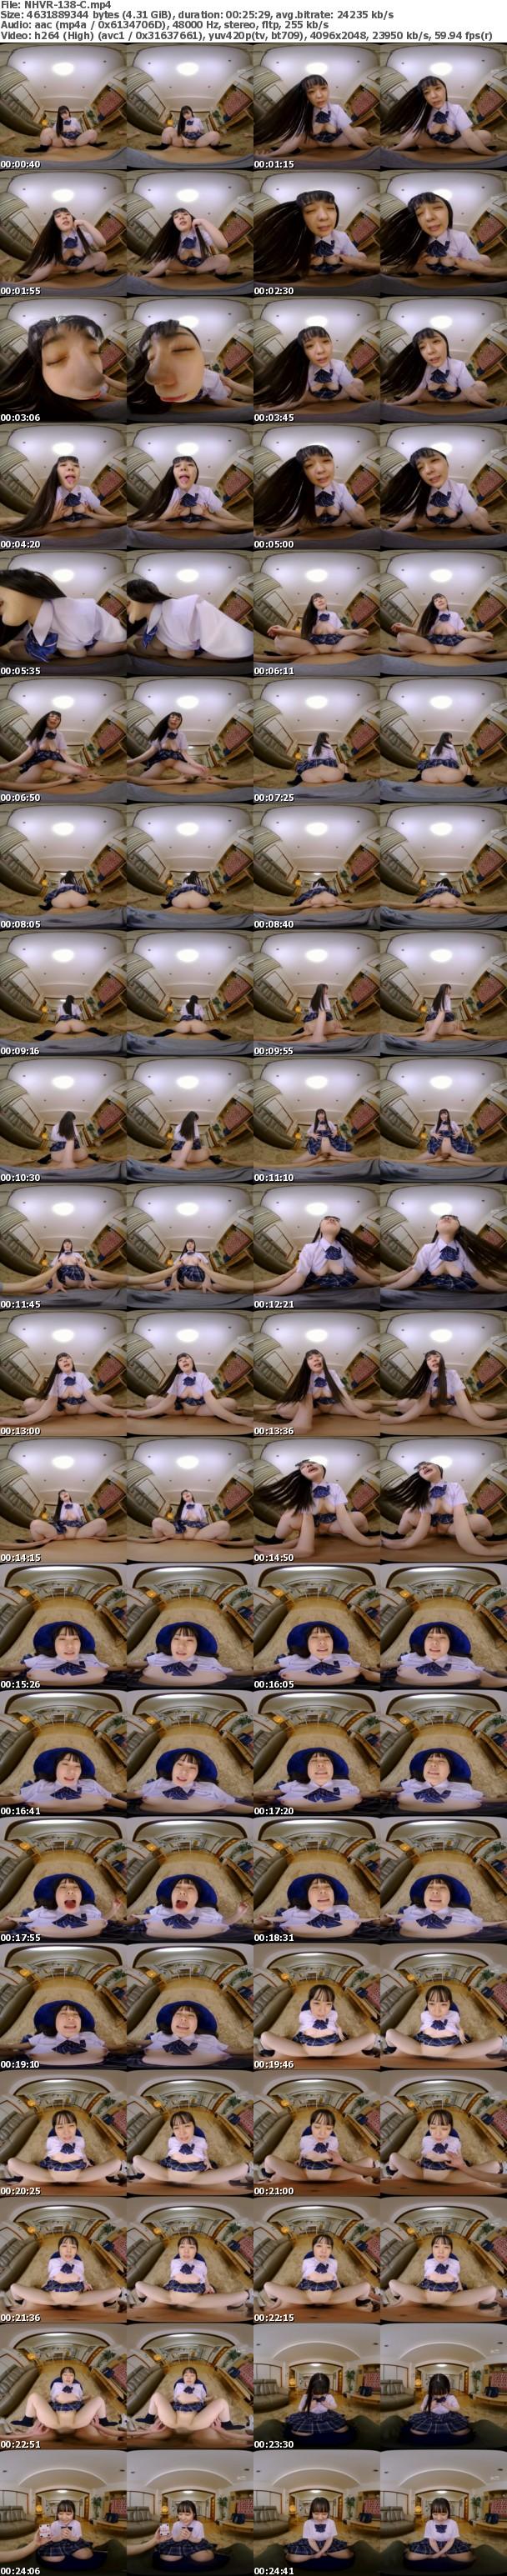 (VR) NHVR-138 「私の唾液も愛液もいっぱい飲んで!!」僕に女汁を飲ませてくるどスケベ女子○生